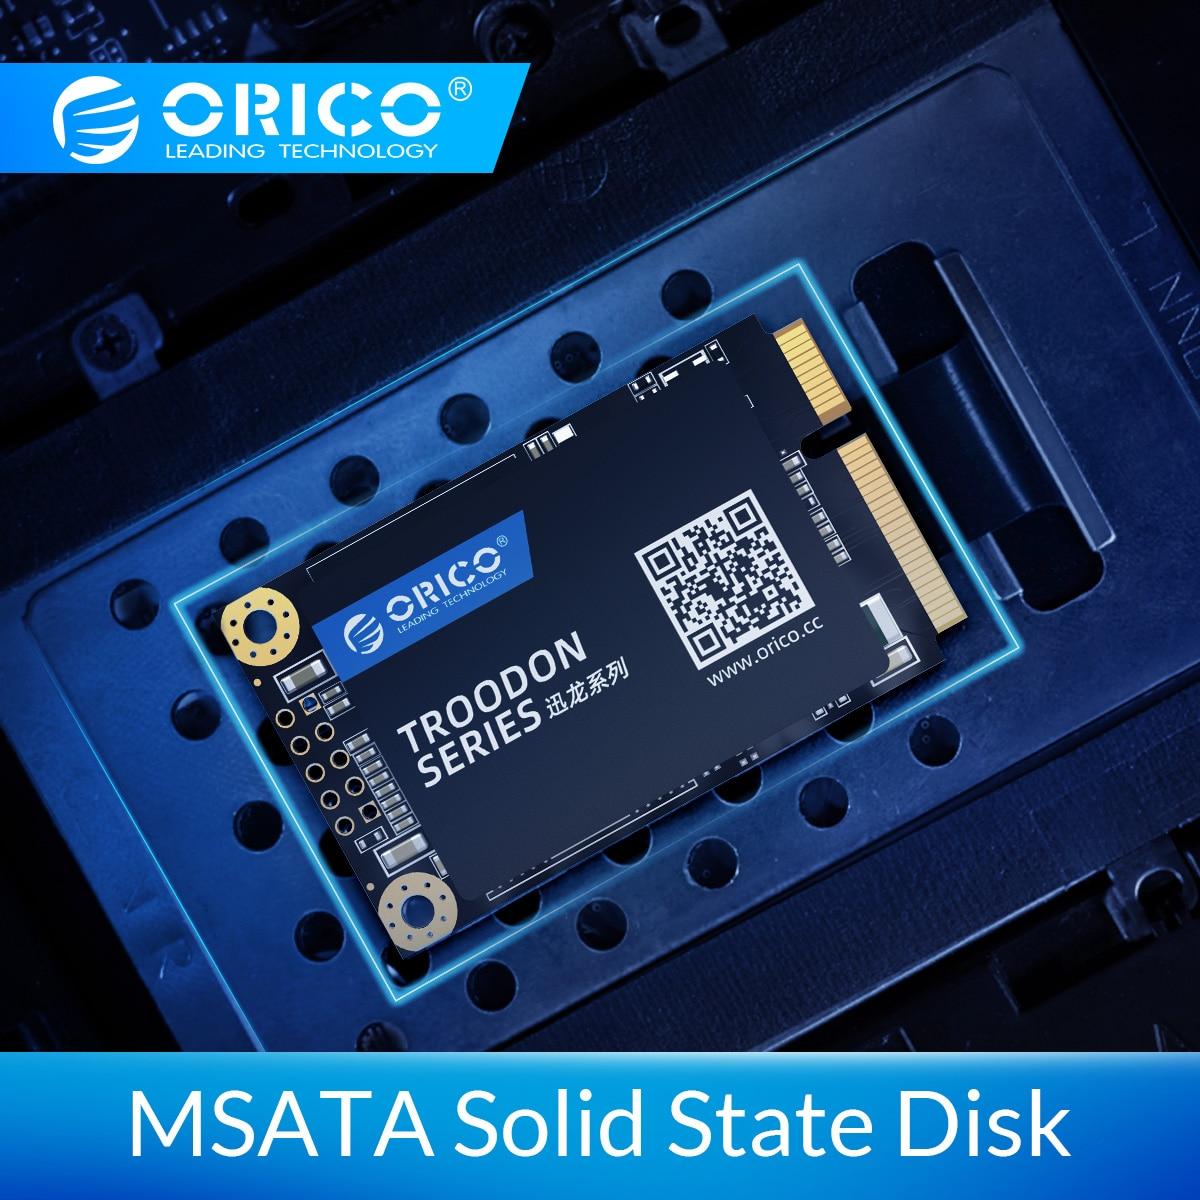 ORICO mSATA SSD Laptop Hard Drive 128GB 256GB 512GB 1TB SATA Internal Solid State Hard Drive For Desktop Laptop